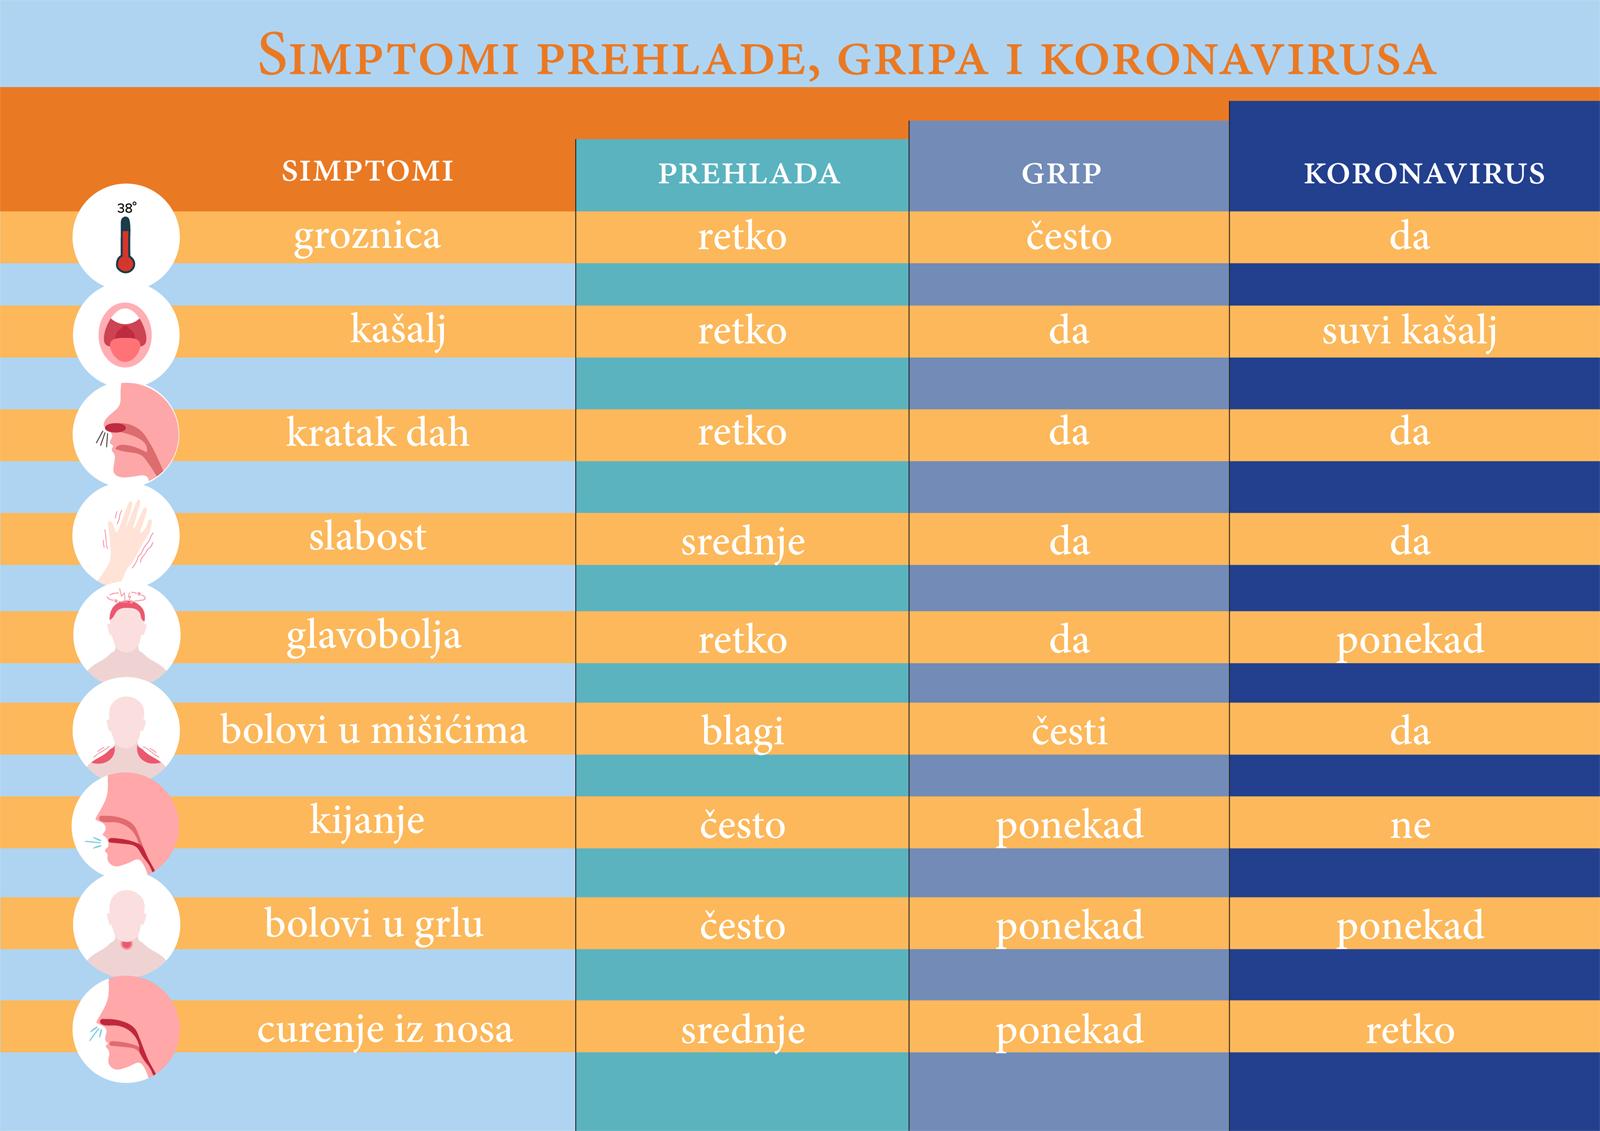 Simptomi grip - prehlada - korona virus